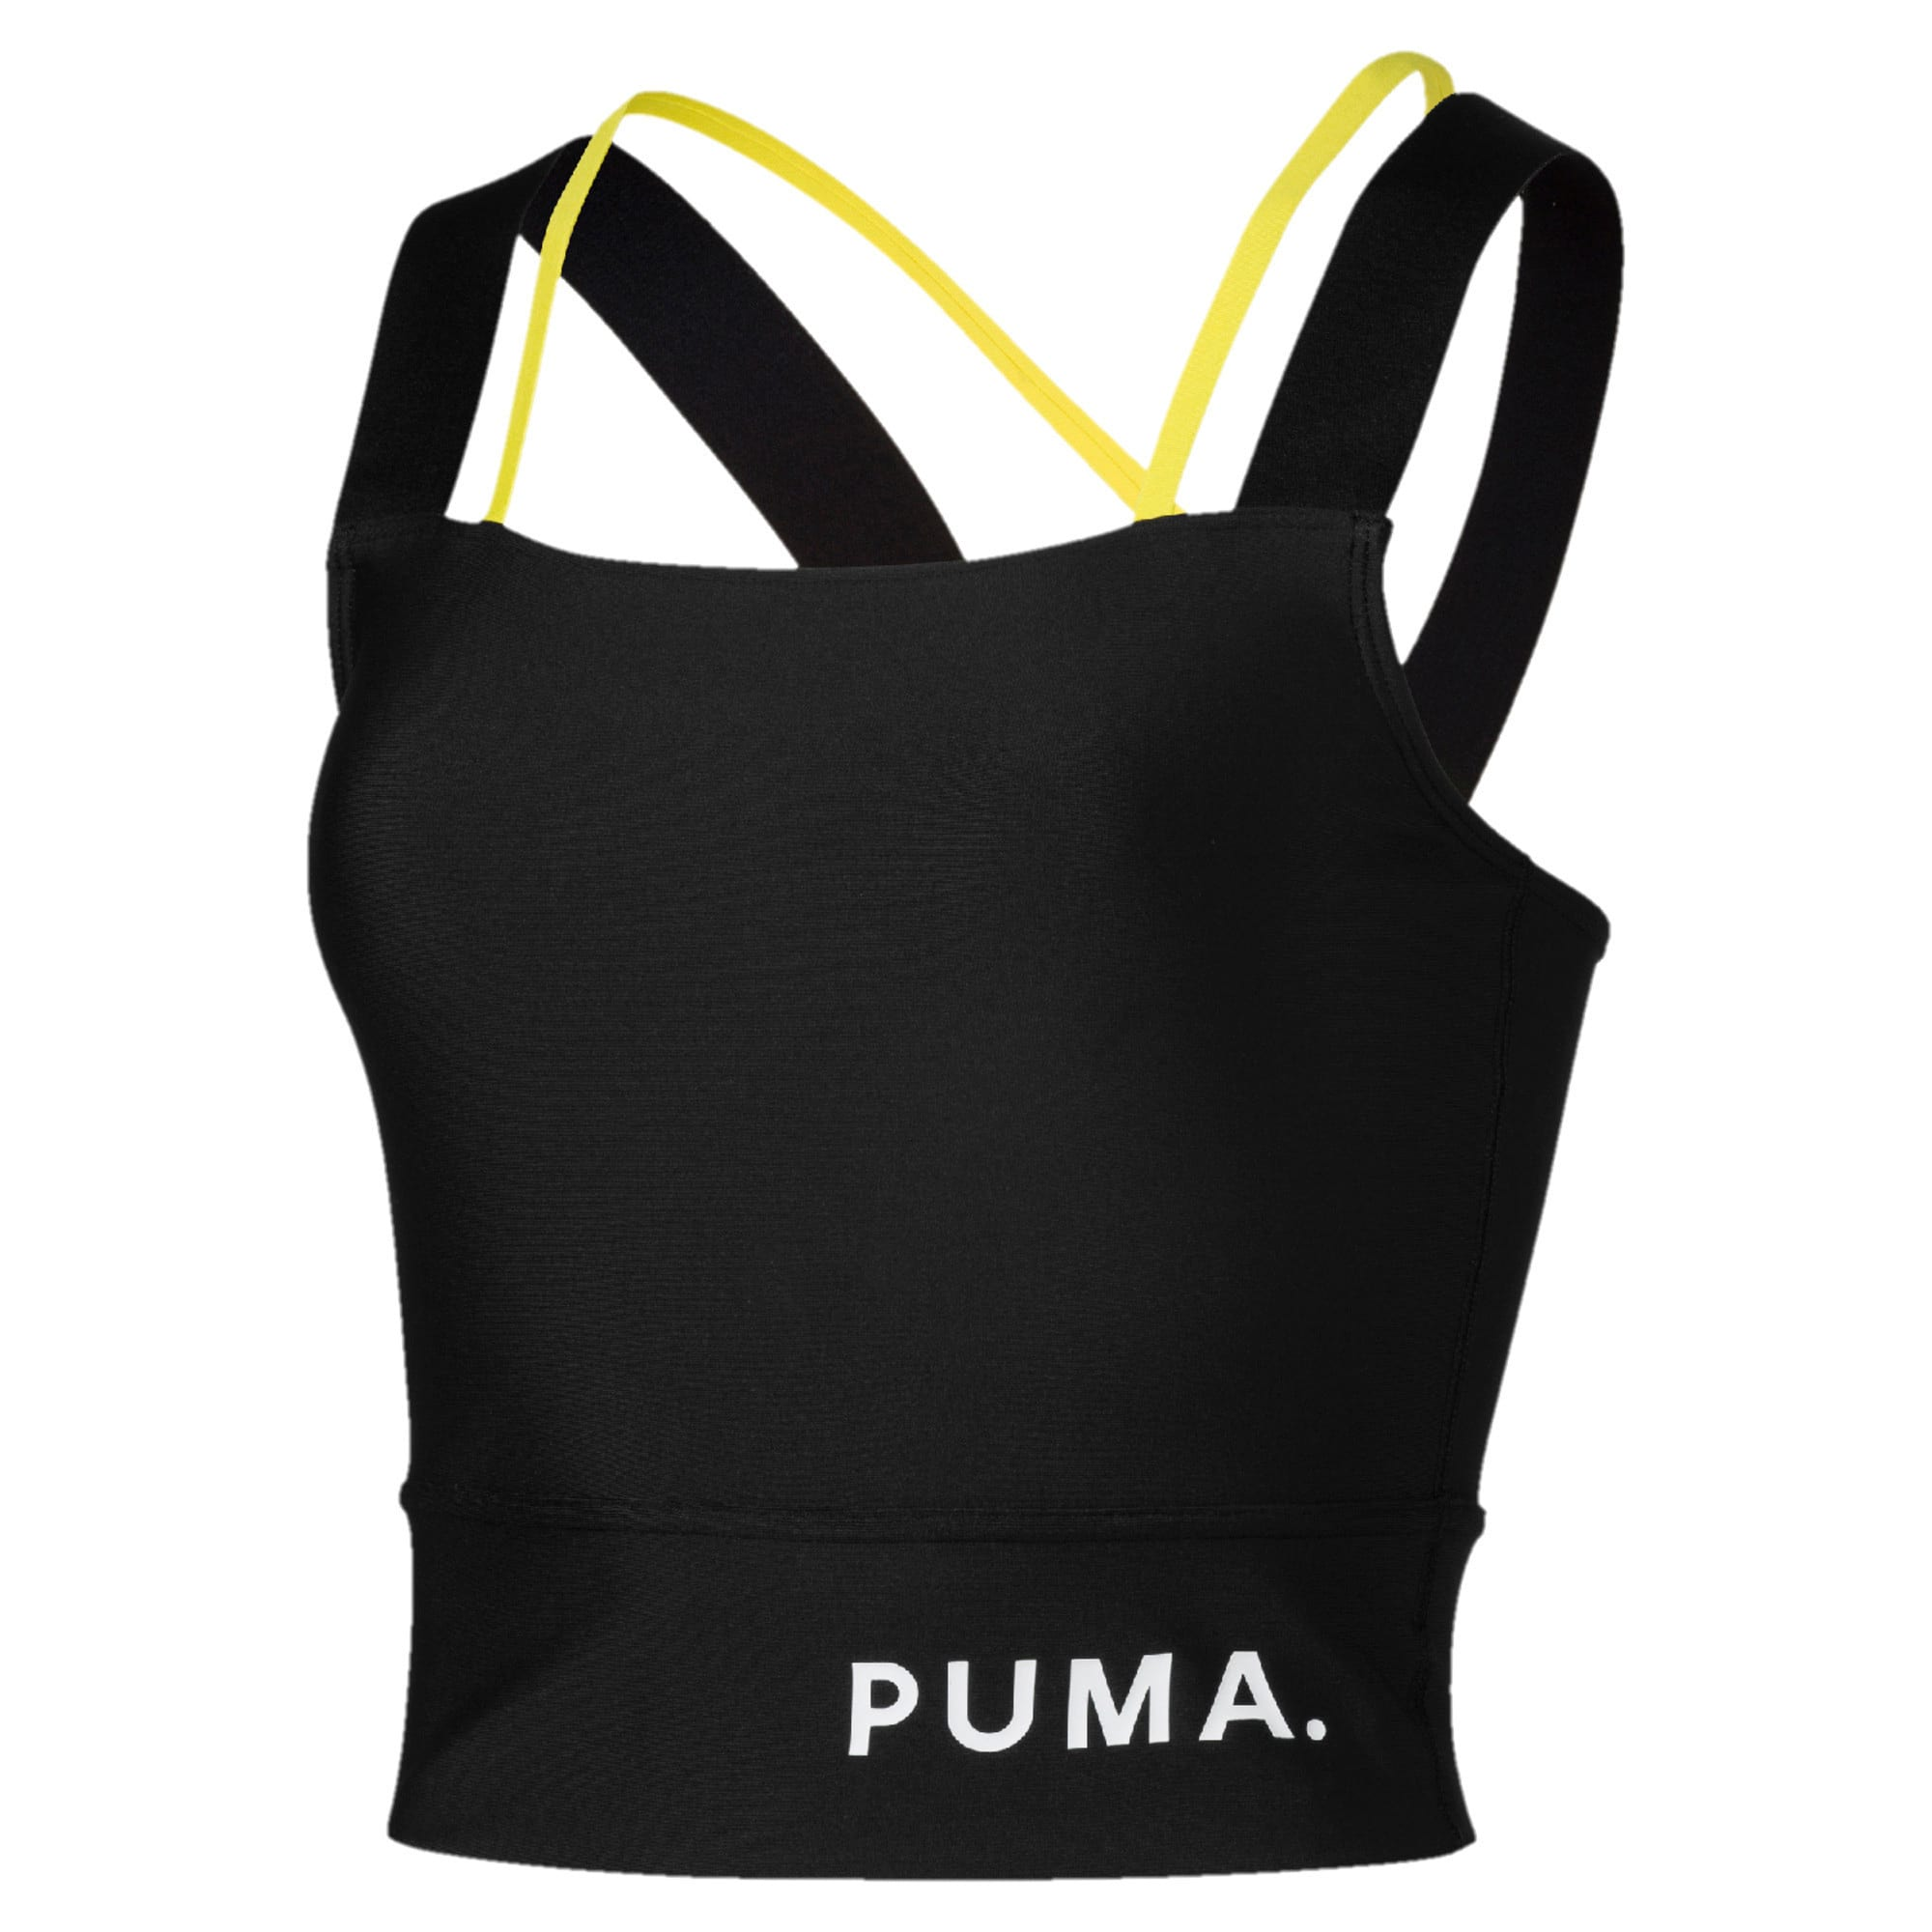 Thumbnail 4 of Chase Women's Crop Top, Puma Black, medium-IND